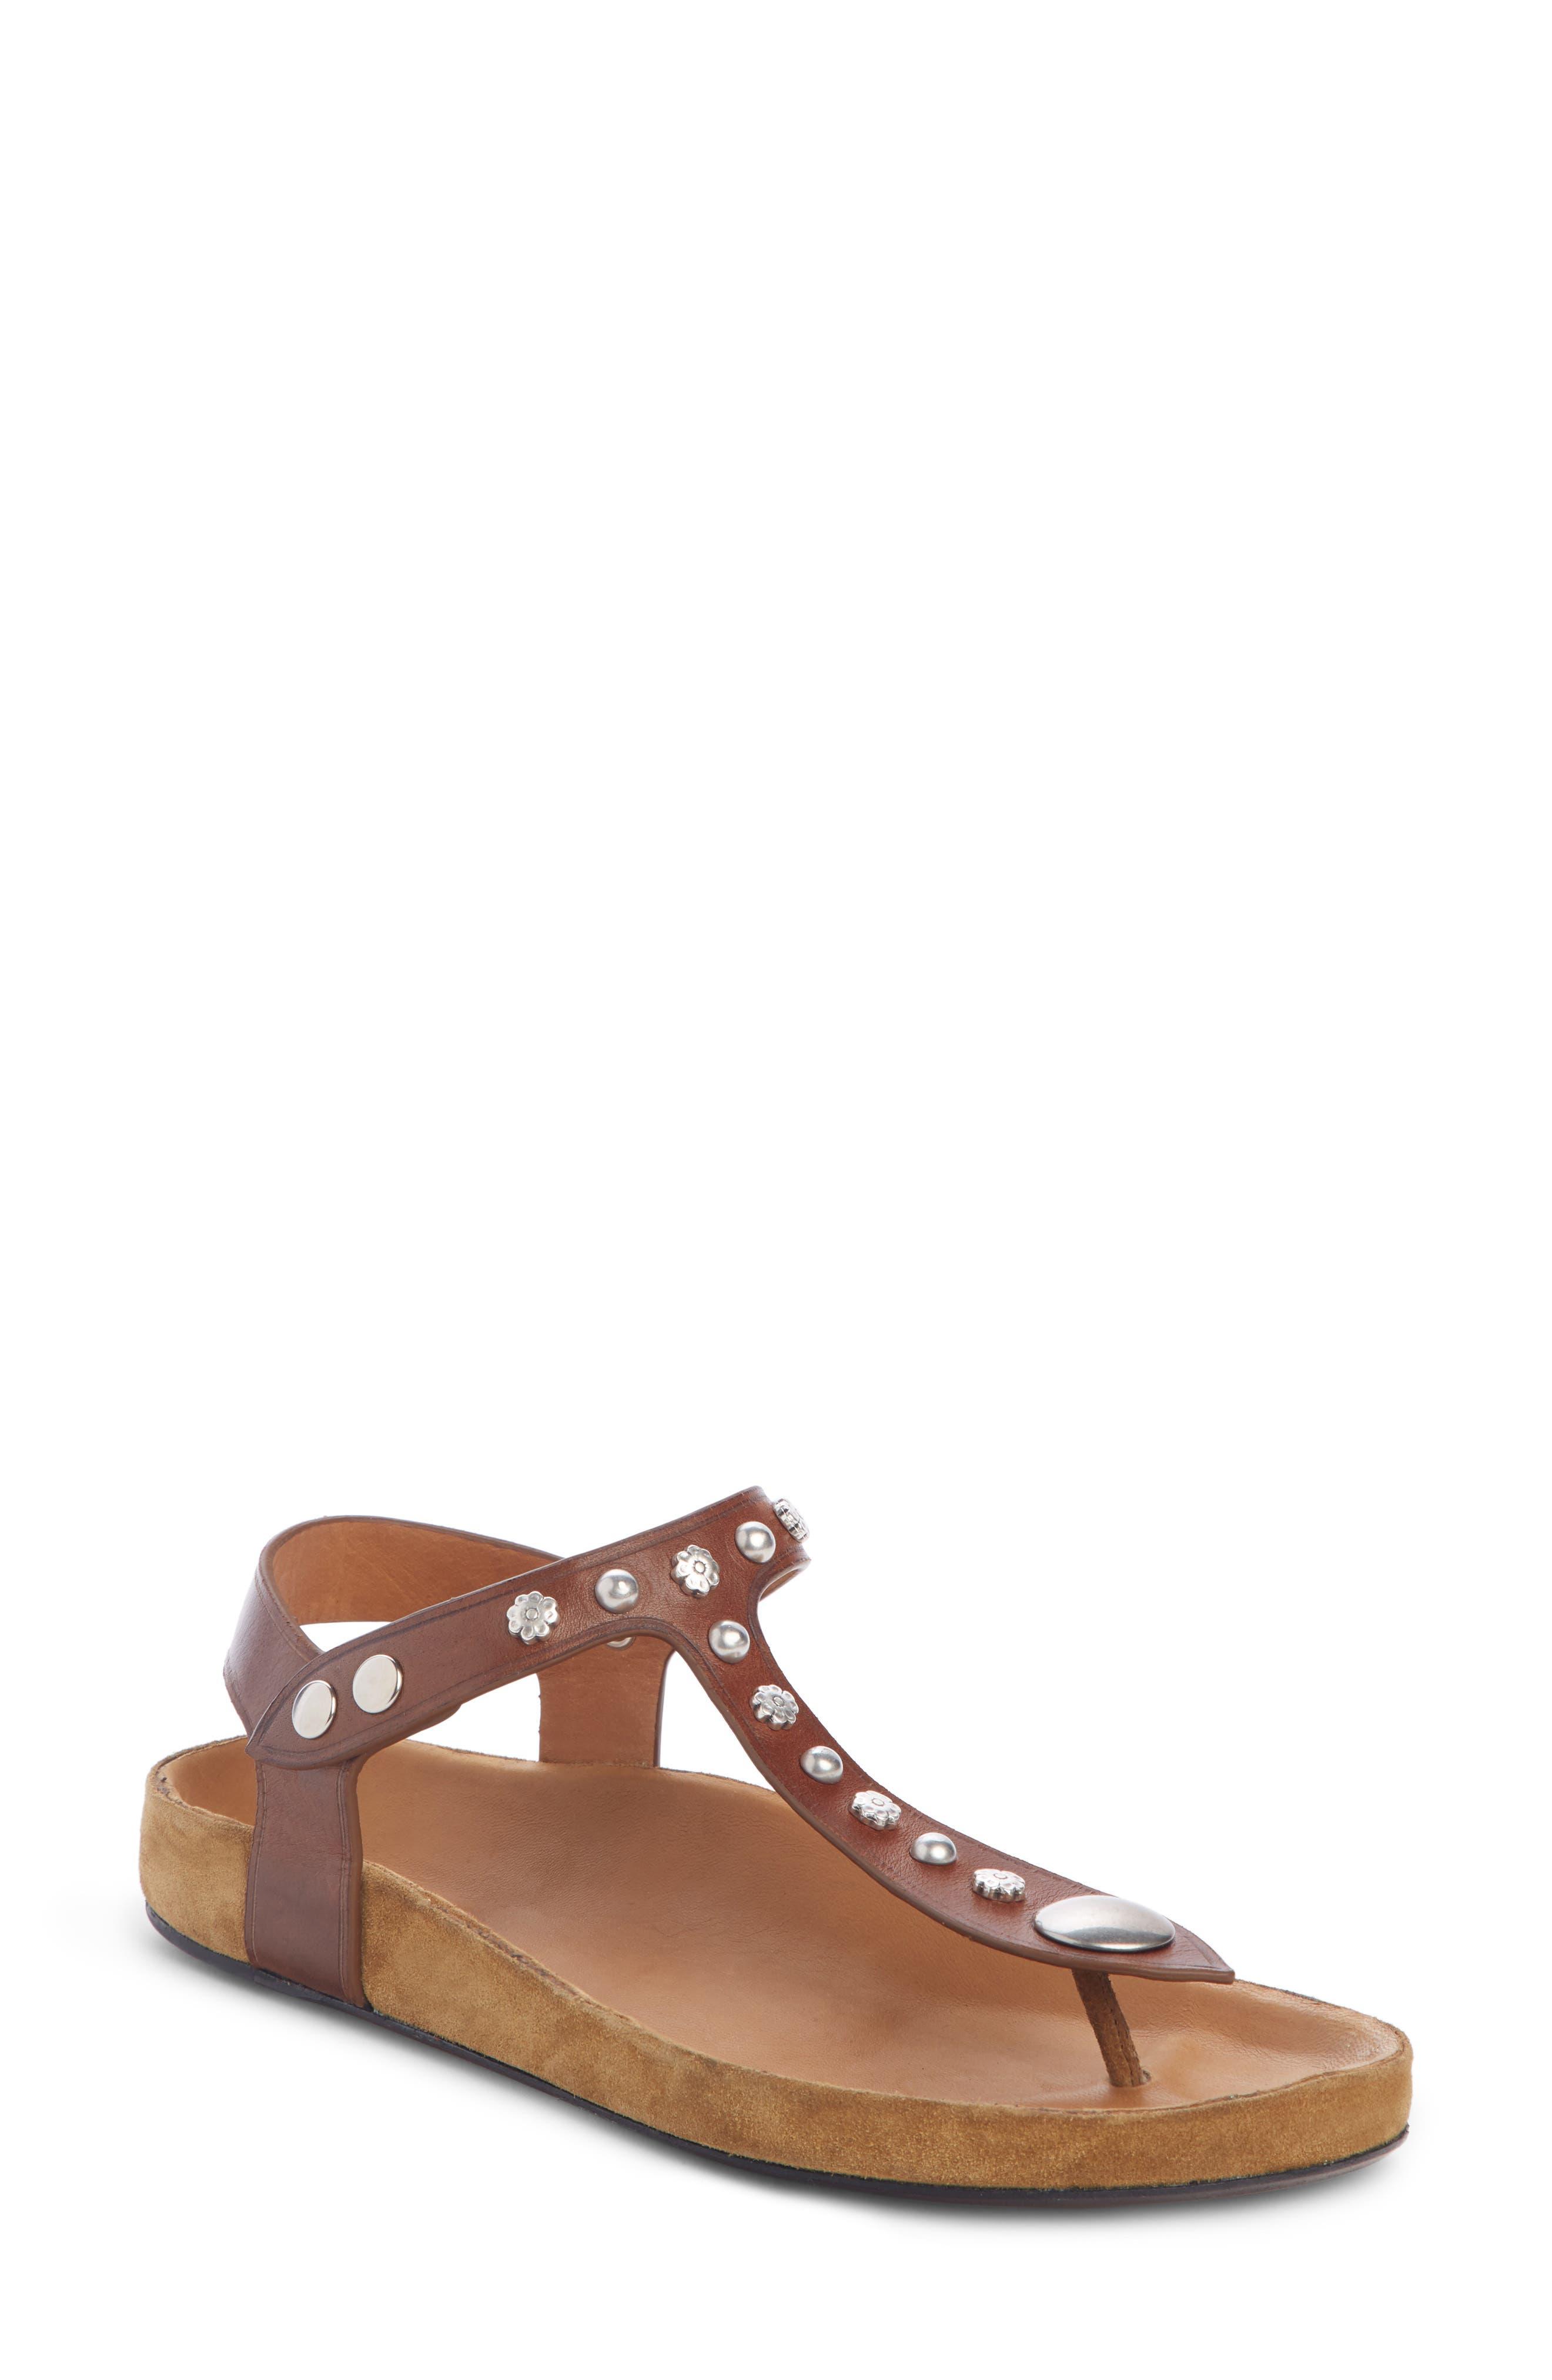 Isabel Marant Enore Studded Sandal, Brown